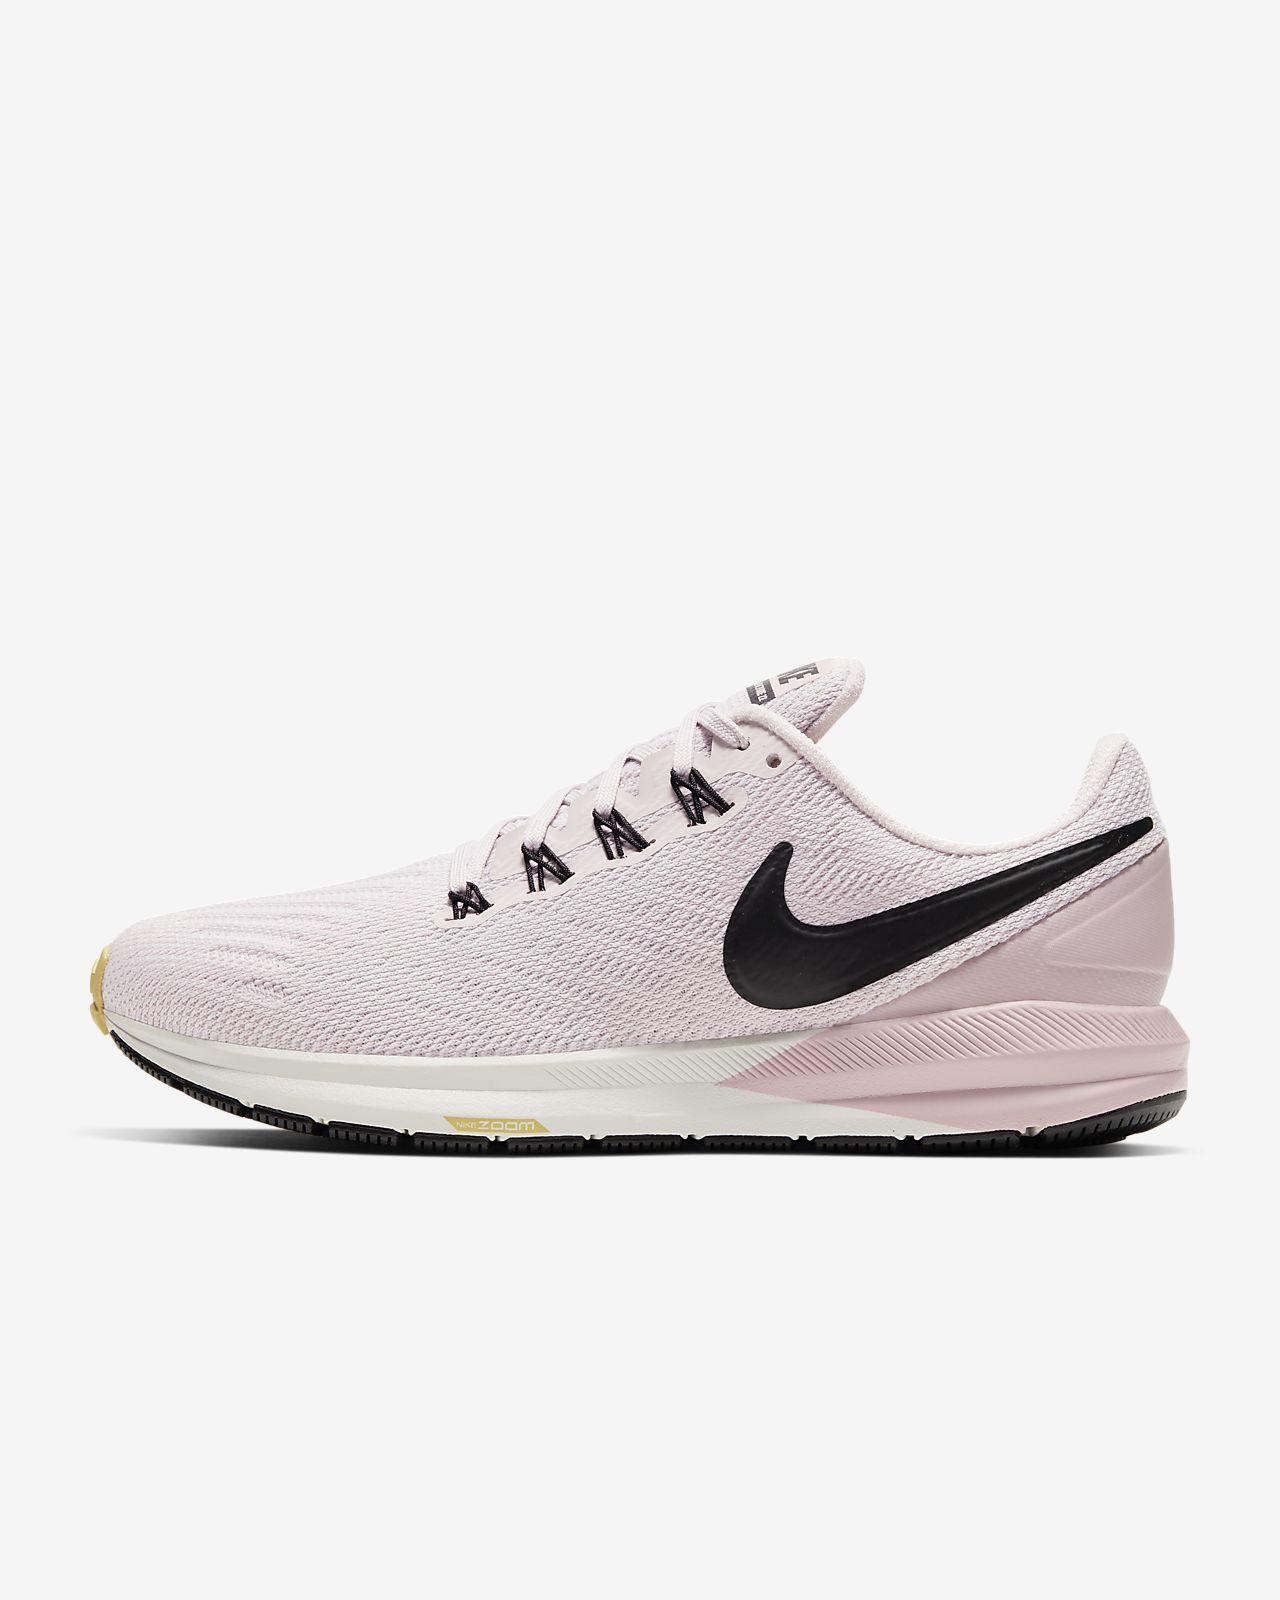 Nike Air Zoom Structure 22 Damen-Laufschuh